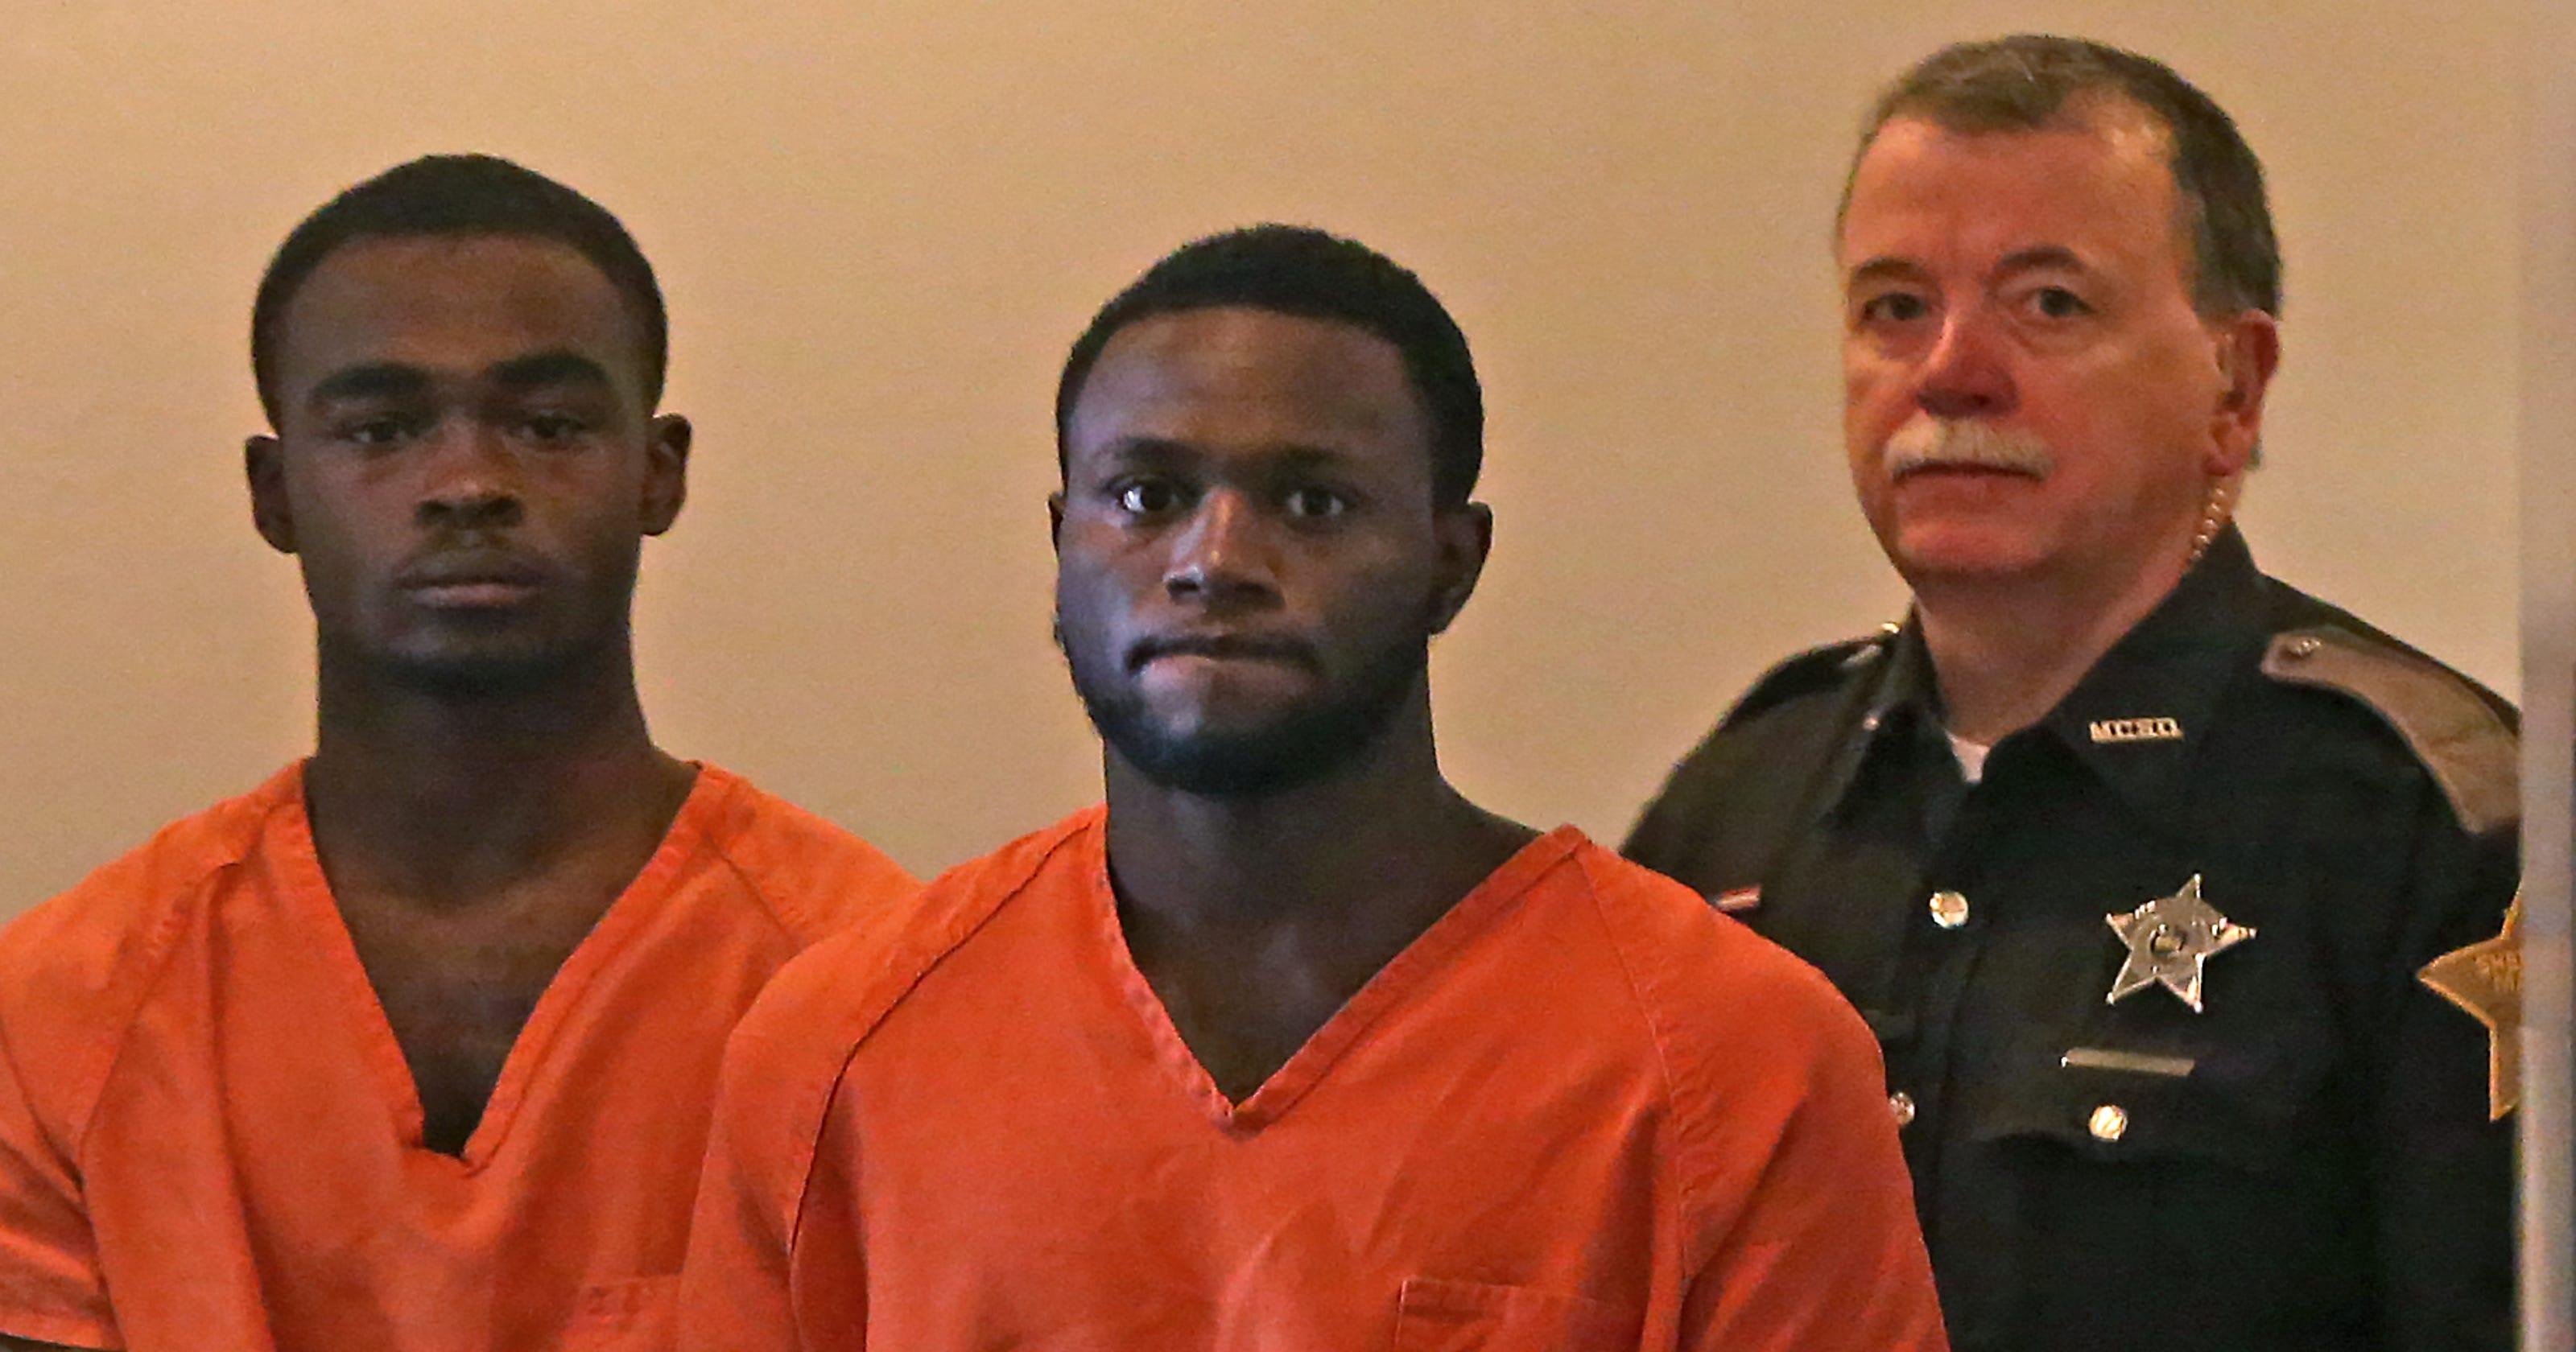 Amanda Blackburn case: Murder suspect arrested